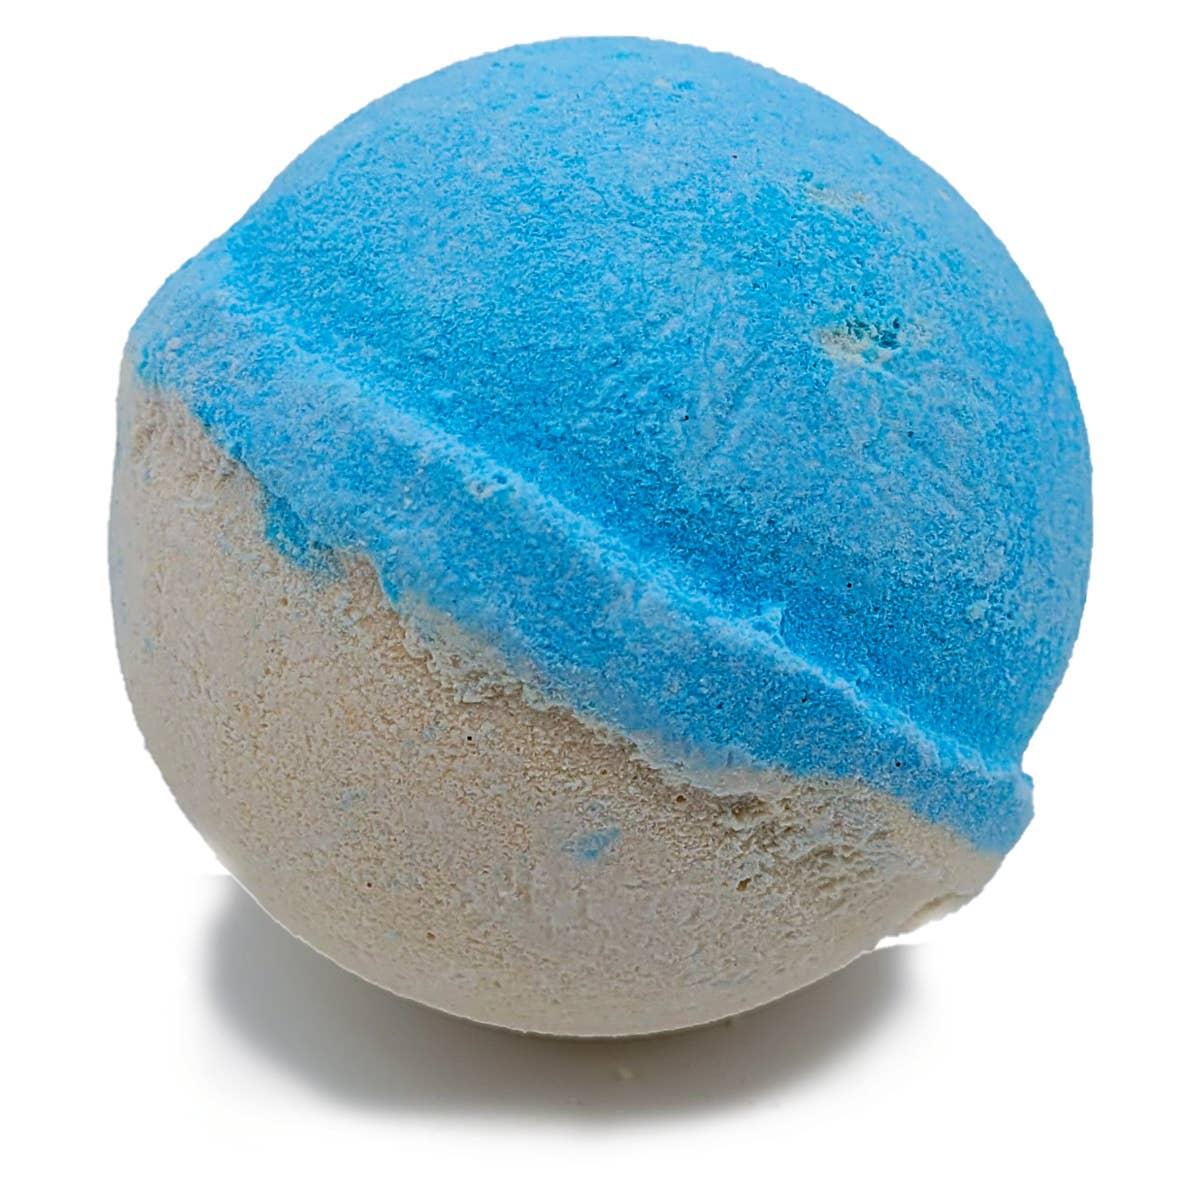 Evolve - Bath Bomb - Driftwood | Trada Marketplace